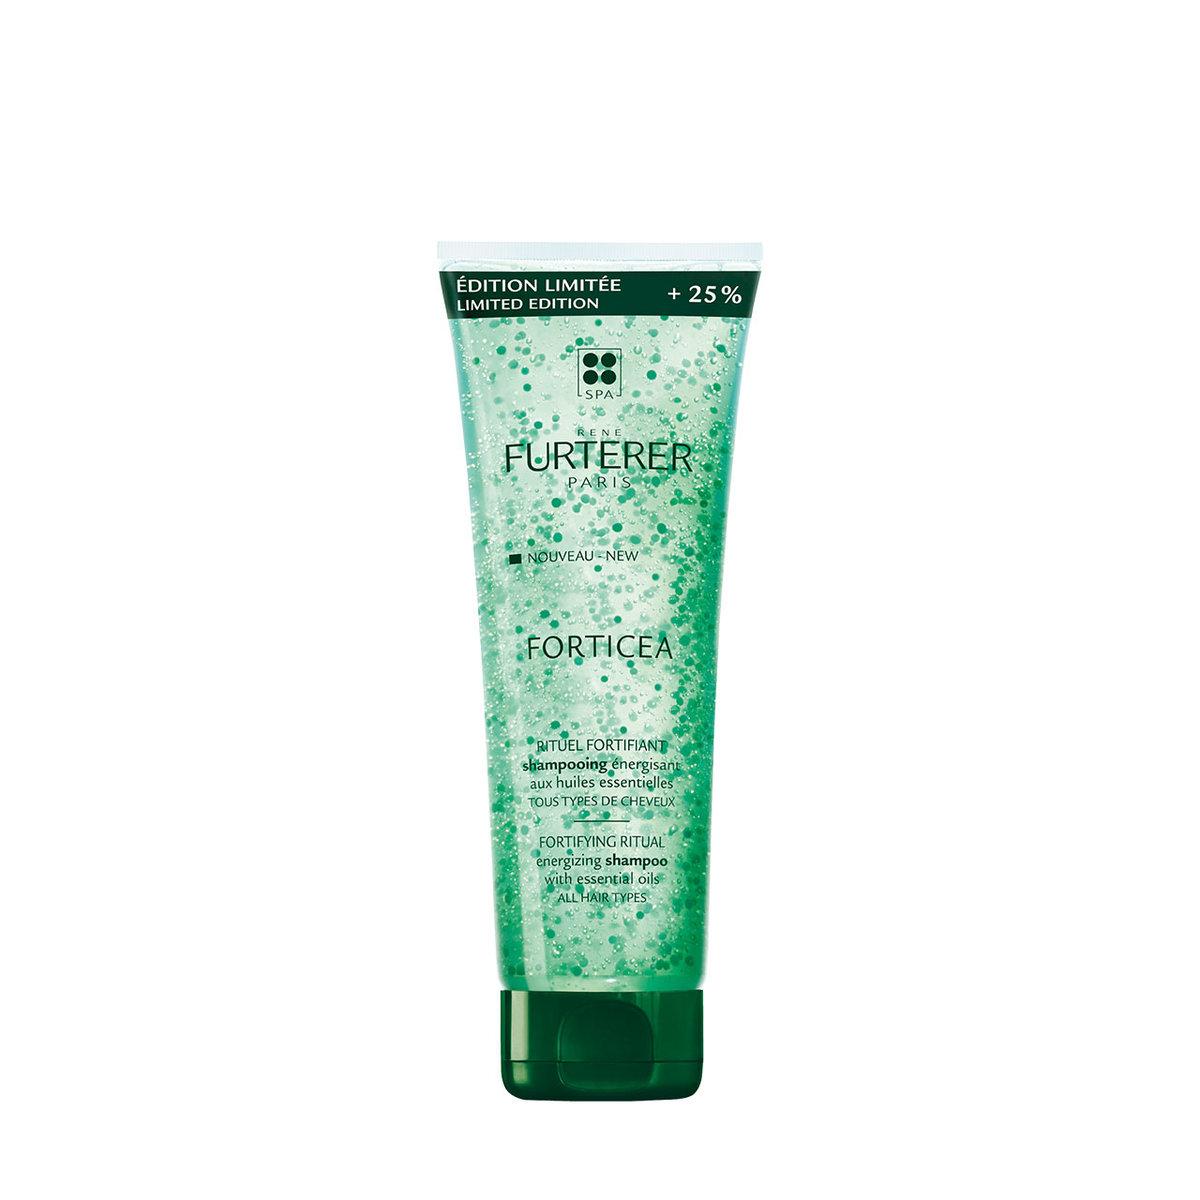 FORTICEA Energizing Shampoo (250 ml)